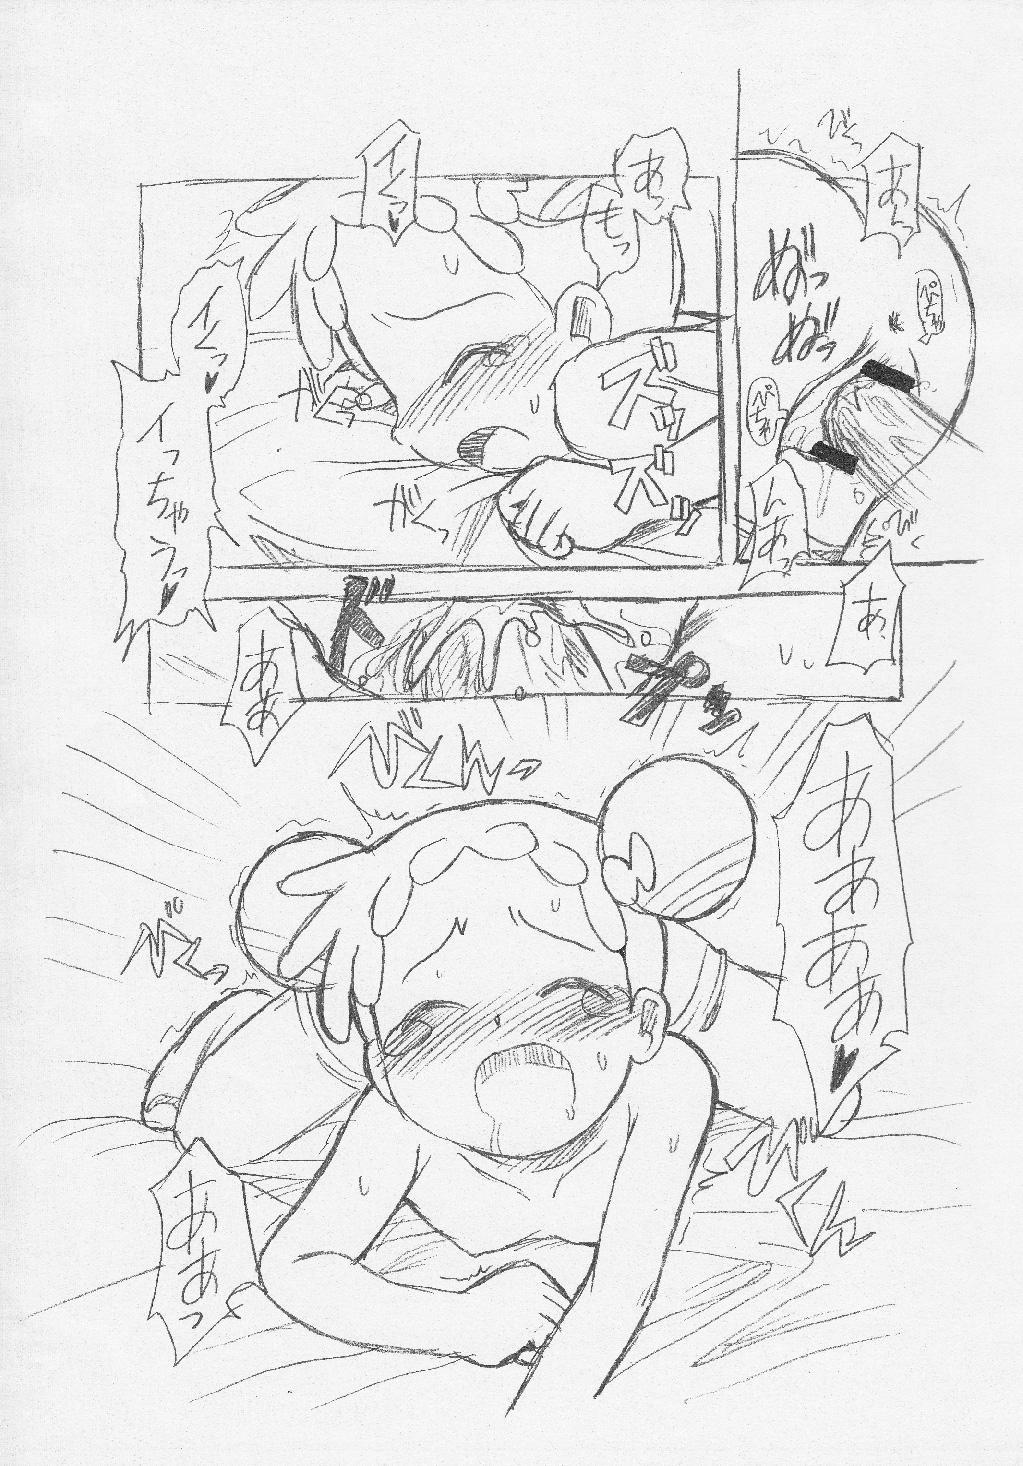 [ Okosama Pankeki (Arurukaana 7A)]Gekkan oko pan 2007-nen 8 tsuki-gō (Ojamajo Doremi) 10